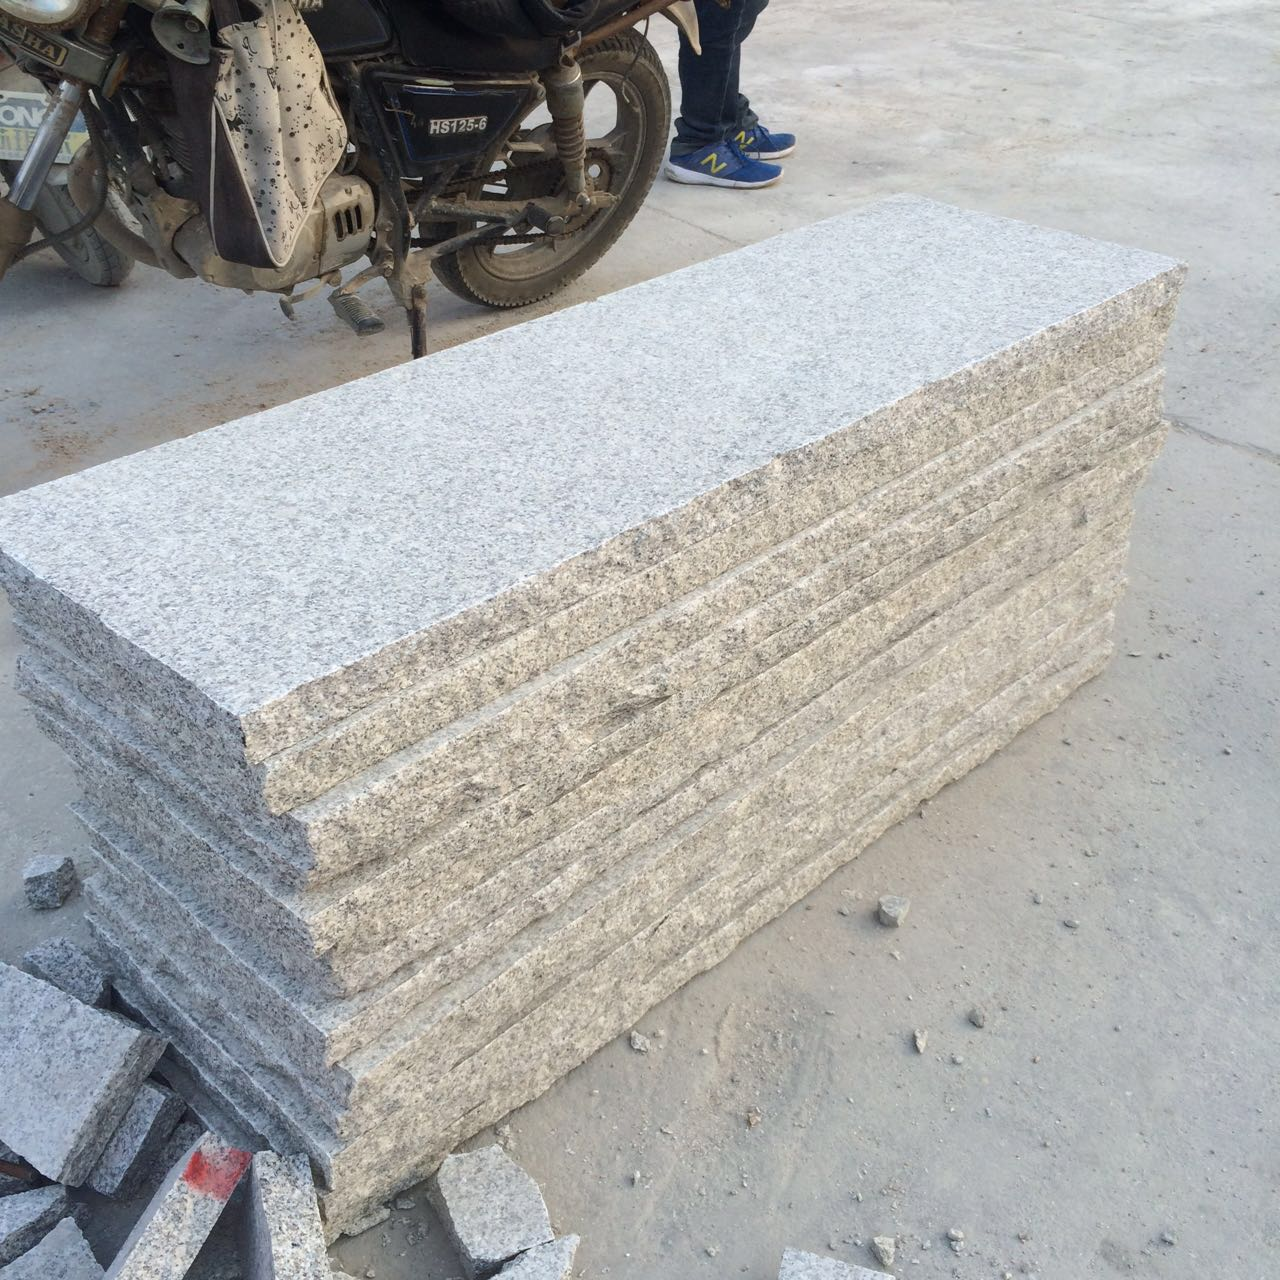 Whtite Granite paving stone